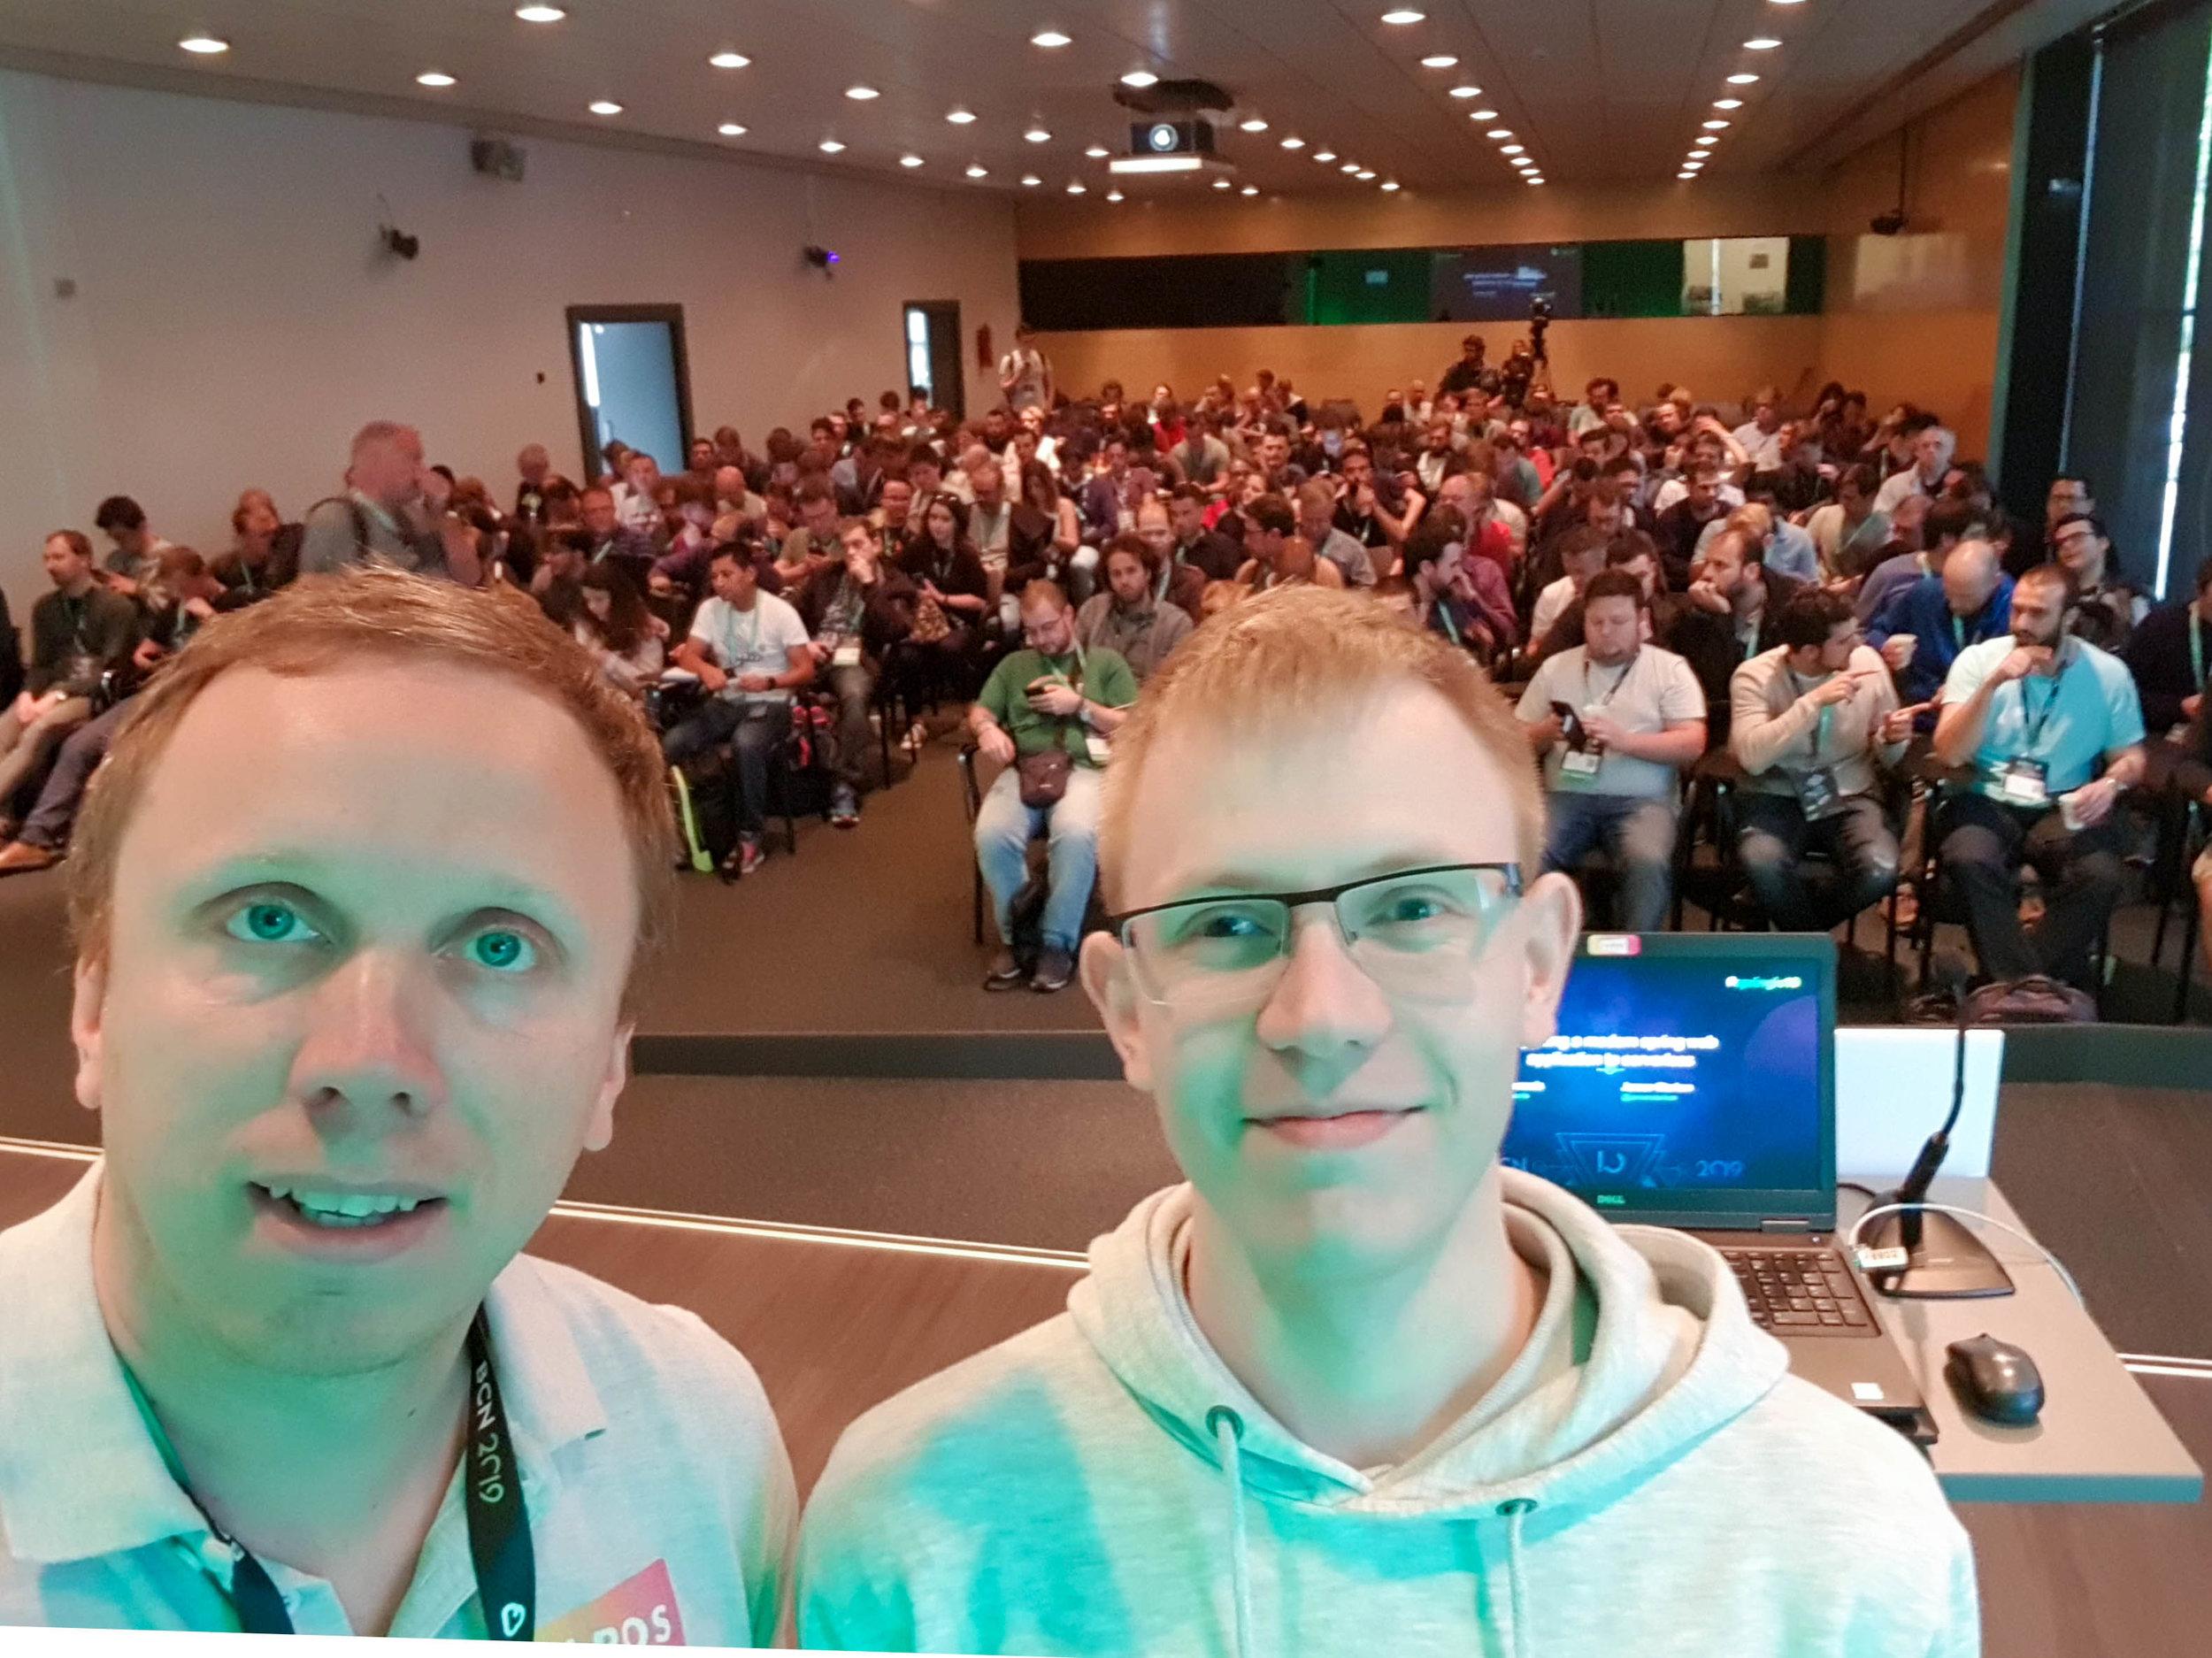 spring-2019-conference-spring-I-O-Barcelona-5.jpg